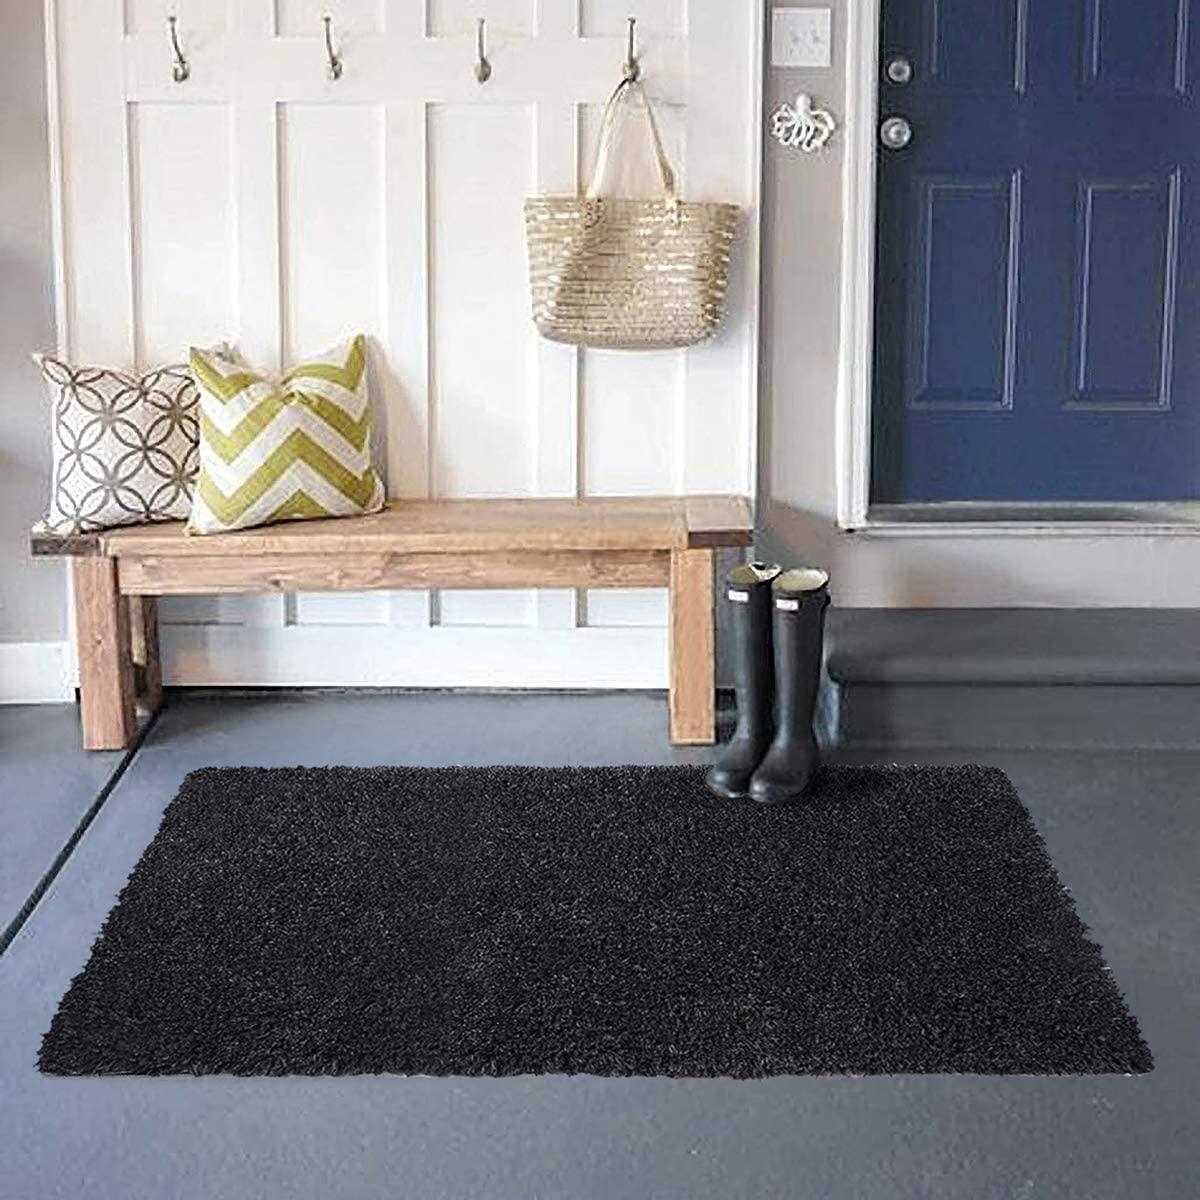 Super Soft Indoor Area Rug Bathroom Runner Bath Mat Non Slip, Machine Washable Accent Fur Rugs for Living Room Decor Dining Floor 24x36 Inch(Black)